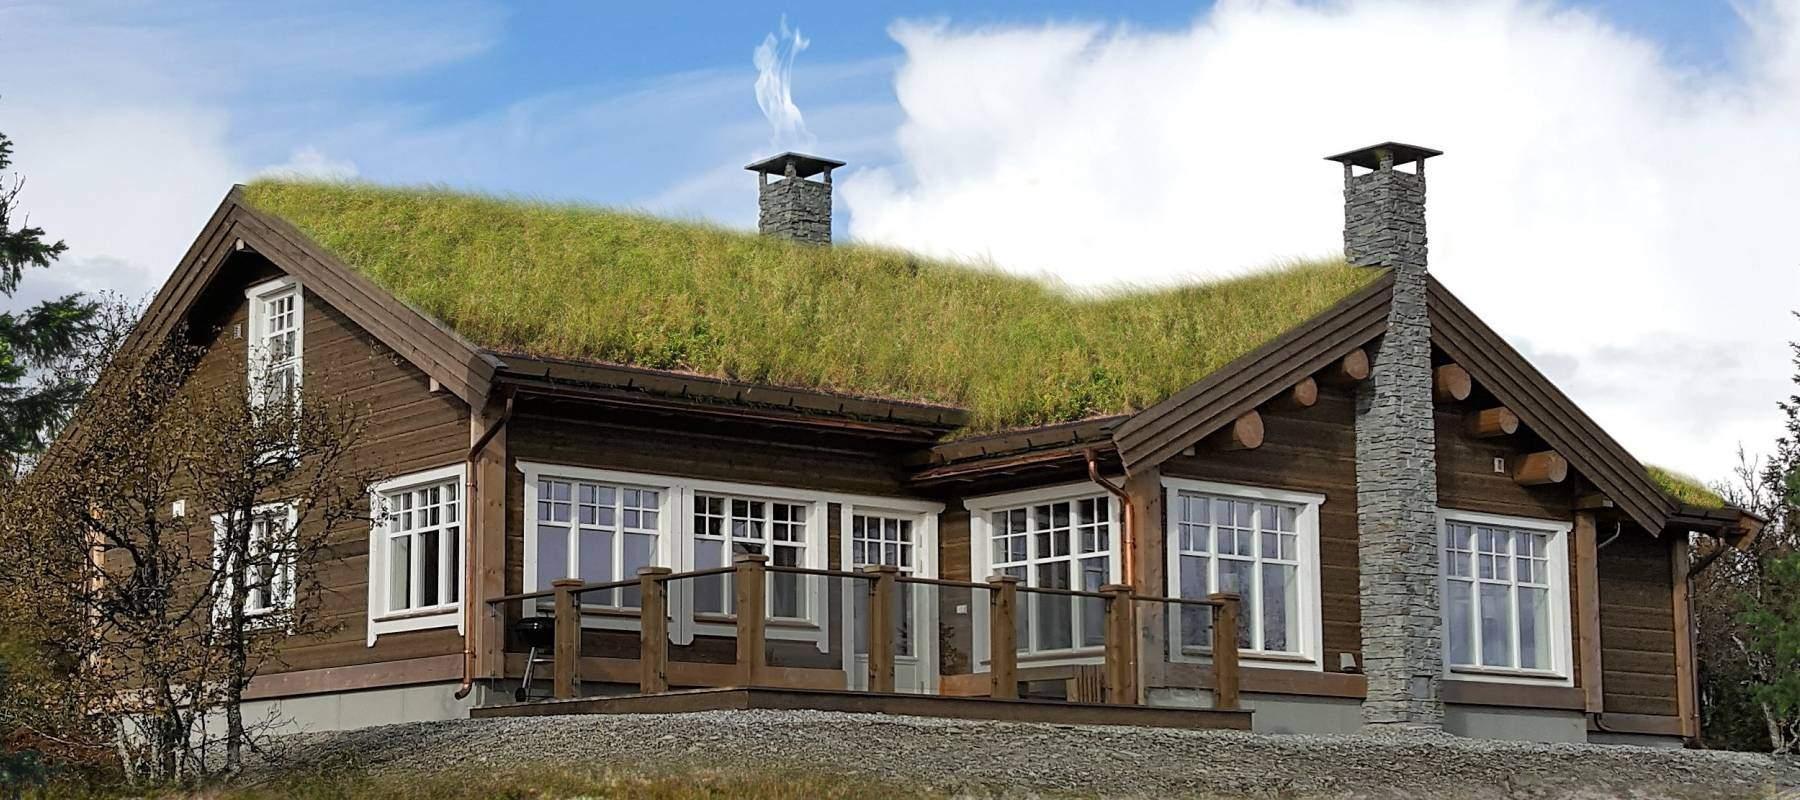 2209 Hytte pa Gålå